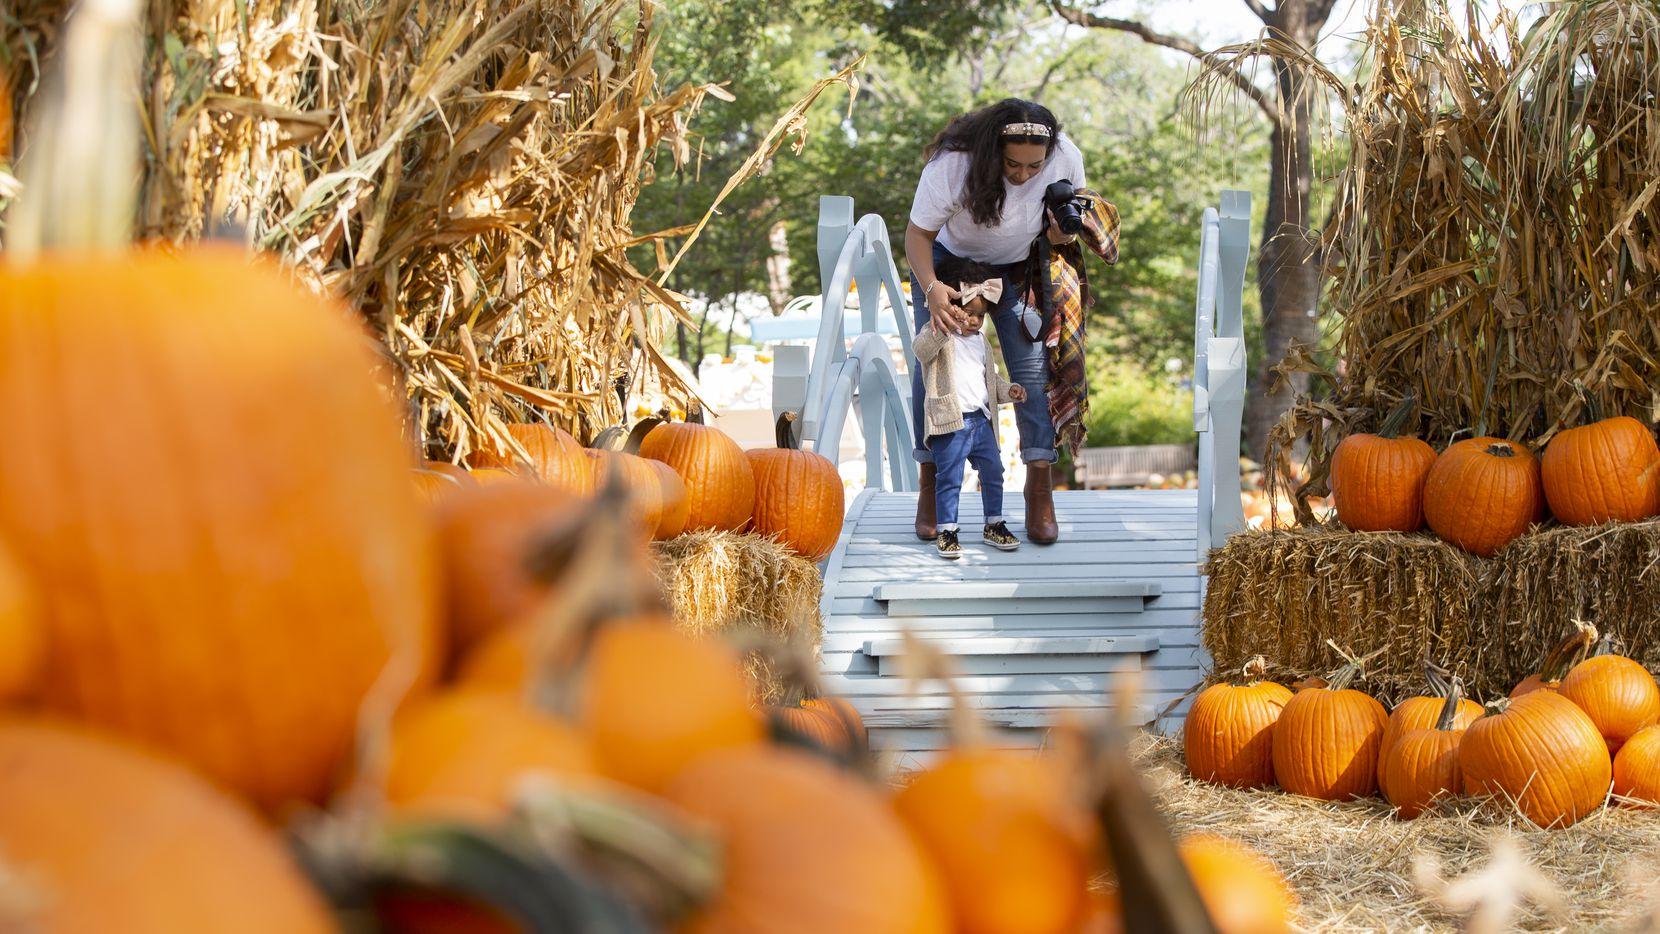 Julianna Baxter helps her 2-year-old Jordyn Simmons off the bridge at the Dallas Arboretum's Pumpkin Village on Sept. 18, 2020 in Dallas. (Juan Figueroa/ The Dallas Morning News)